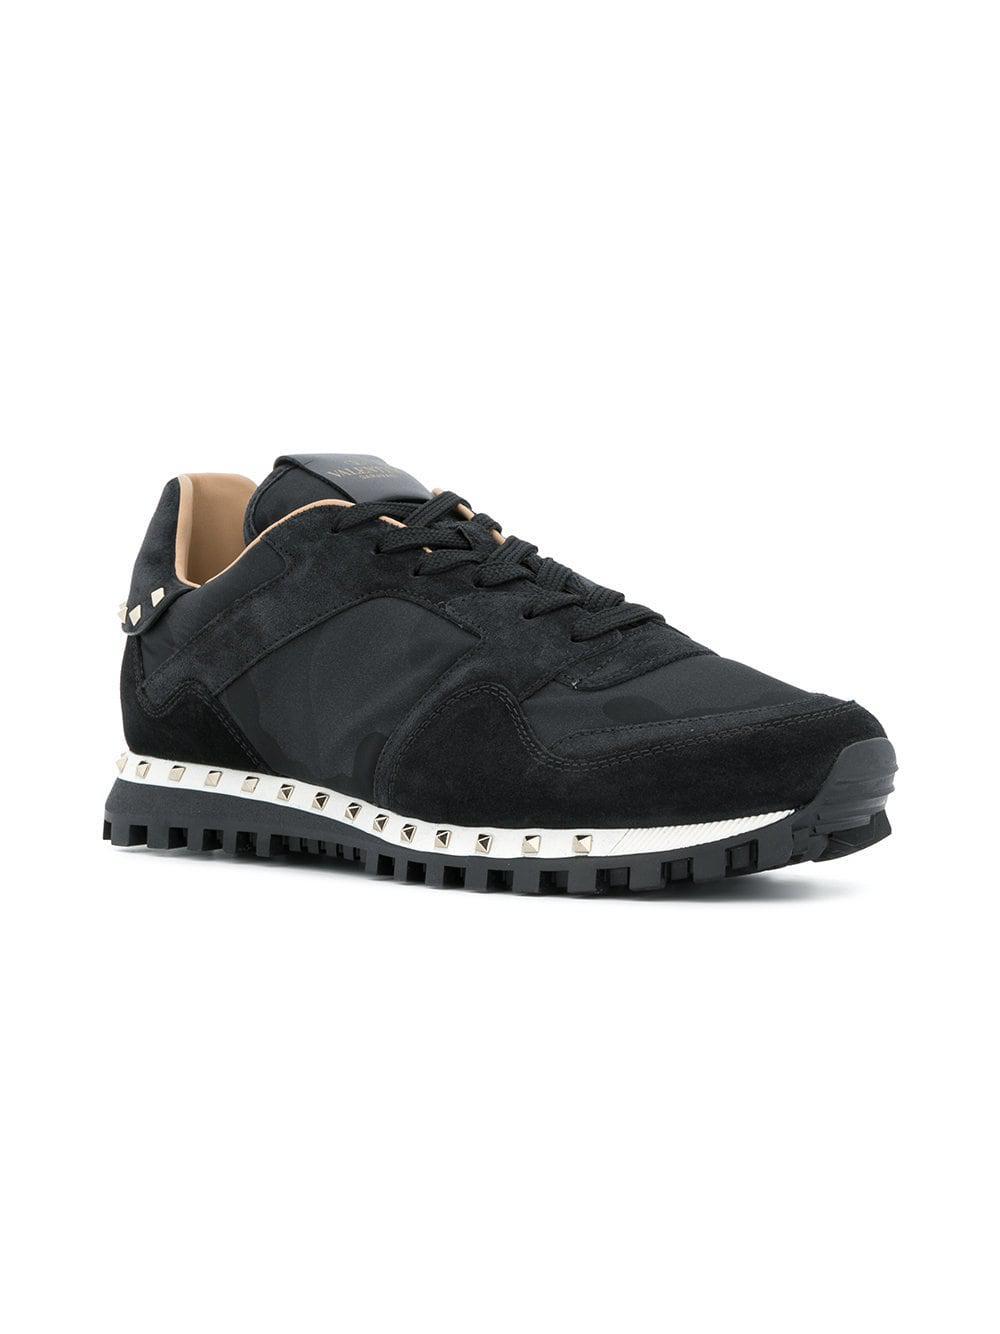 9e15f4066eef5 Lyst - Valentino Garavani Soul Rockstud Sneakers in Black for Men - Save 44%